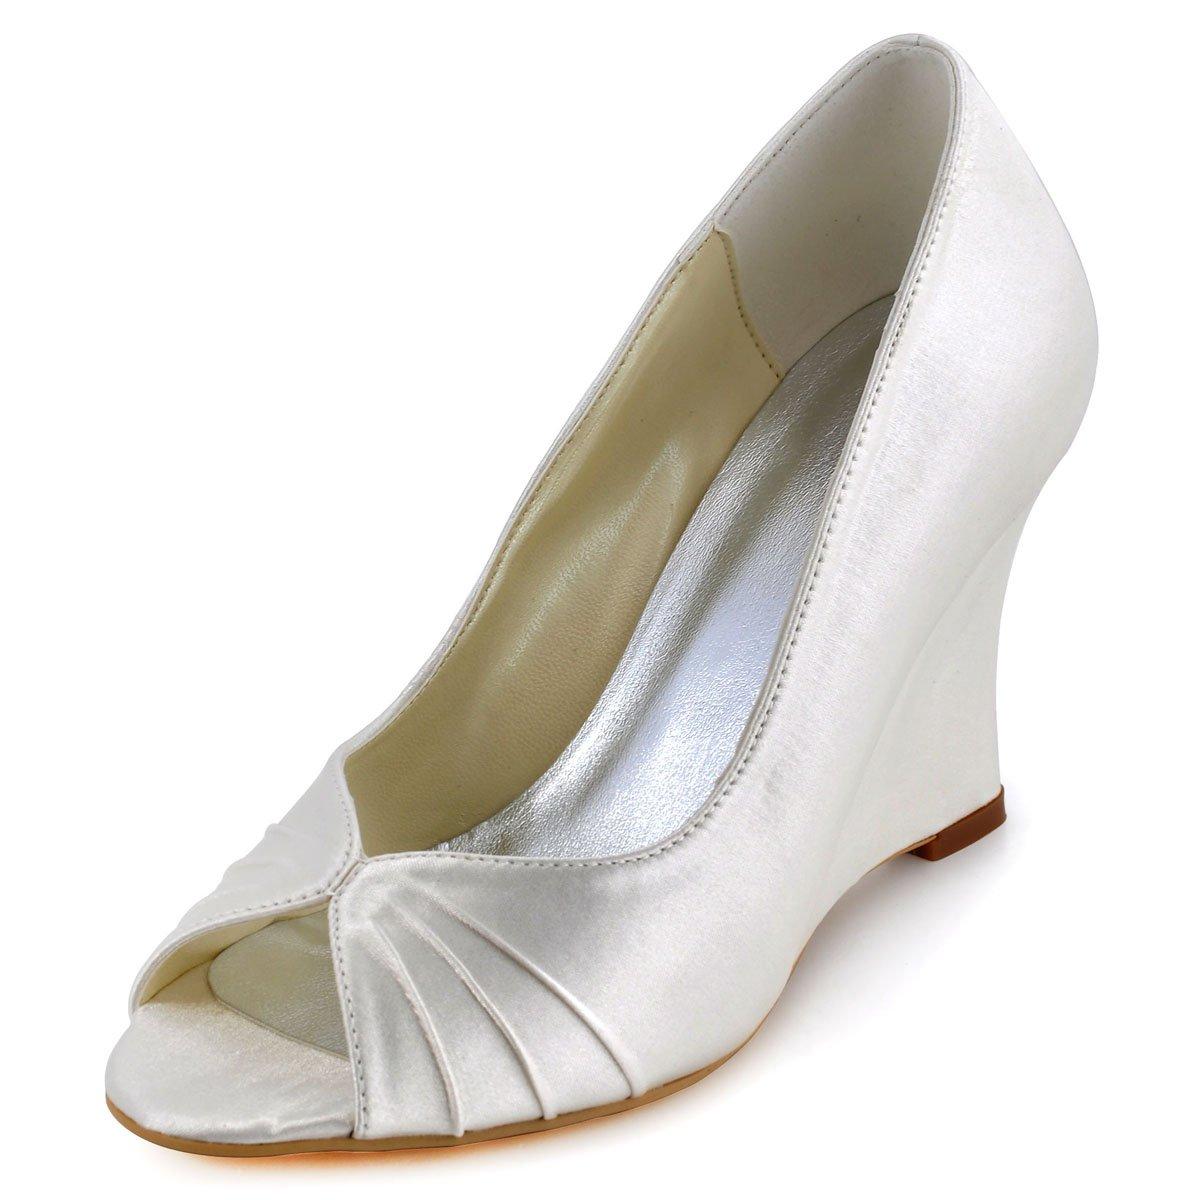 ElegantPark Women High Heel Pumps Peep toe Satin Evening Prom Bridal Wedding Wedges B00E36T6Z2 4 B(M) US|Ivory